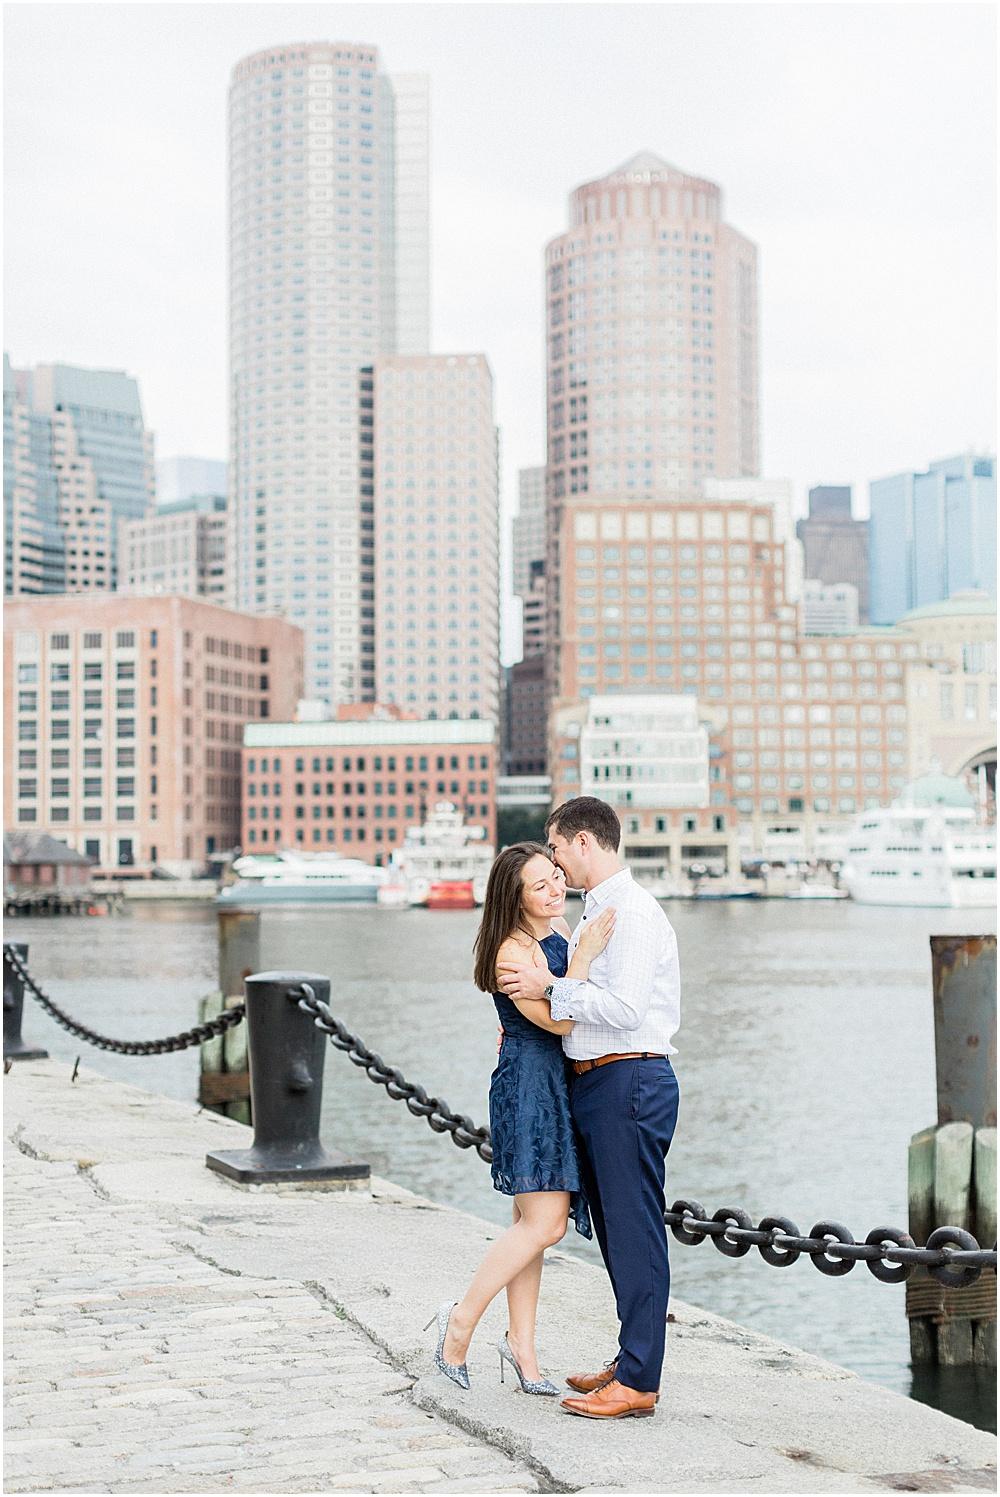 ica_kelsey_Zach_york_maine_boston_seaport_enagement_session_cape_cod_massachusetts_boston_wedding_photographer_meredith_jane_photography_photo_0627.jpg